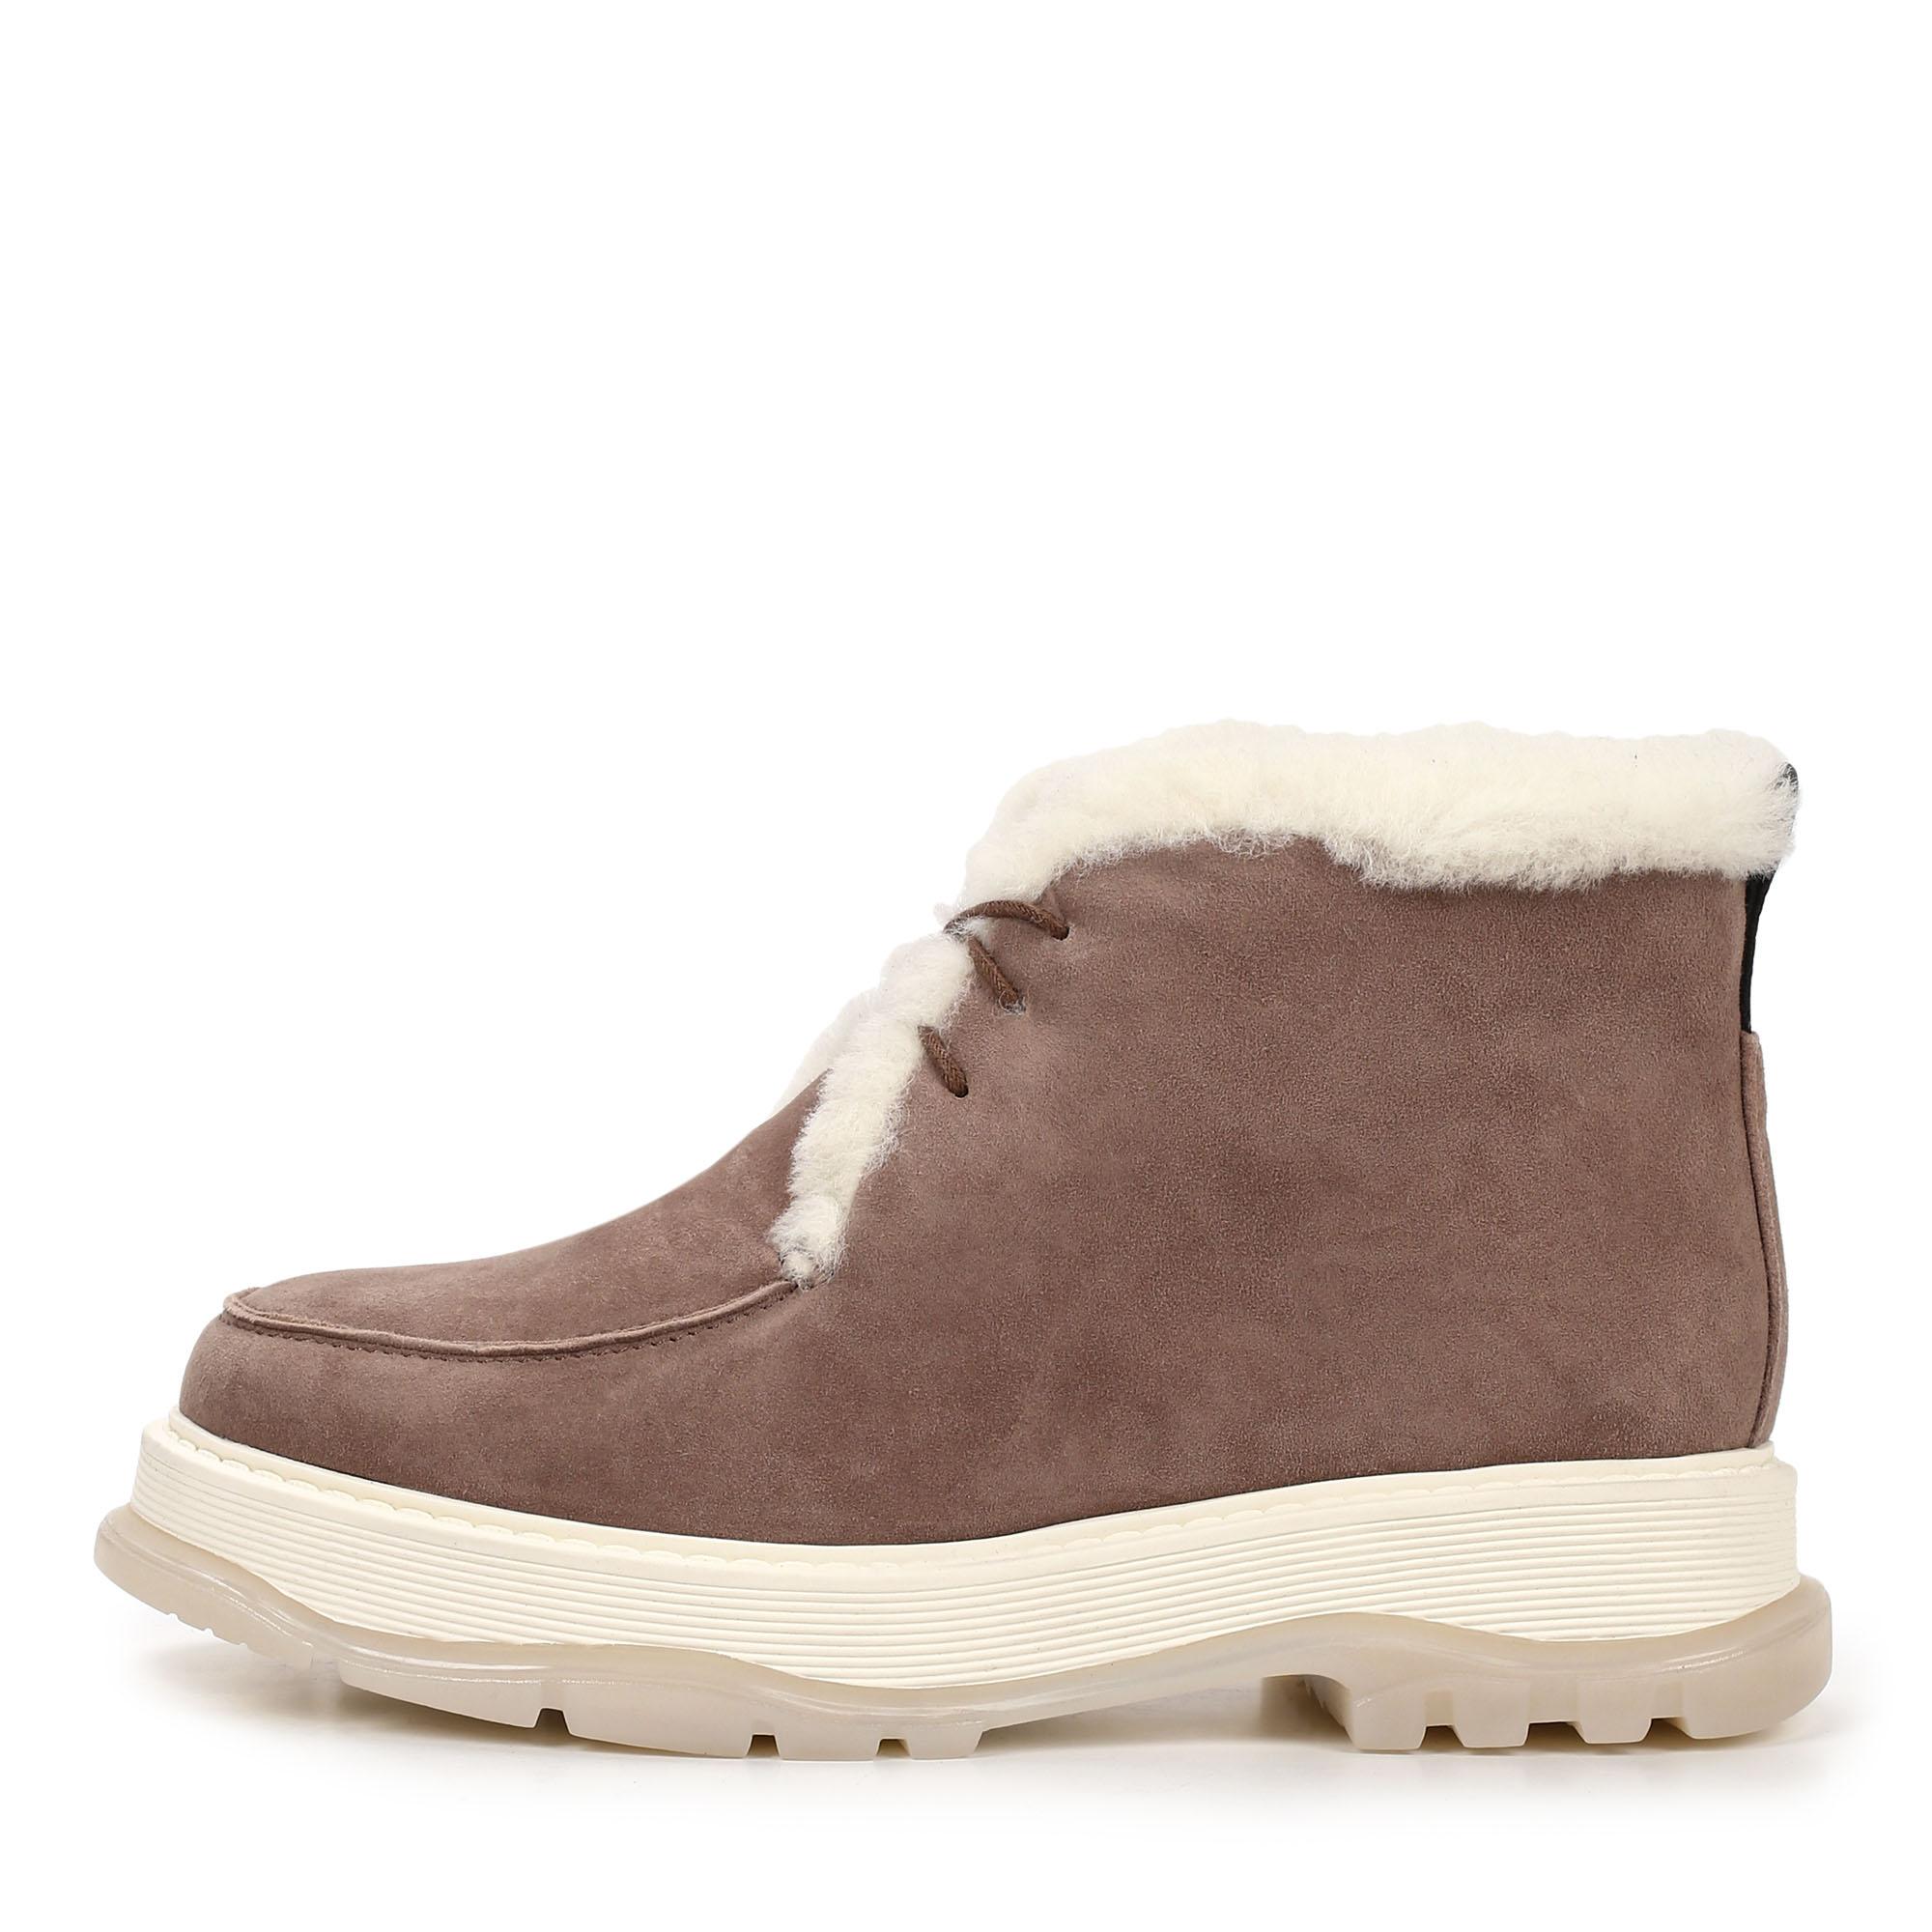 Ботинки Thomas Munz 021-239A-30608